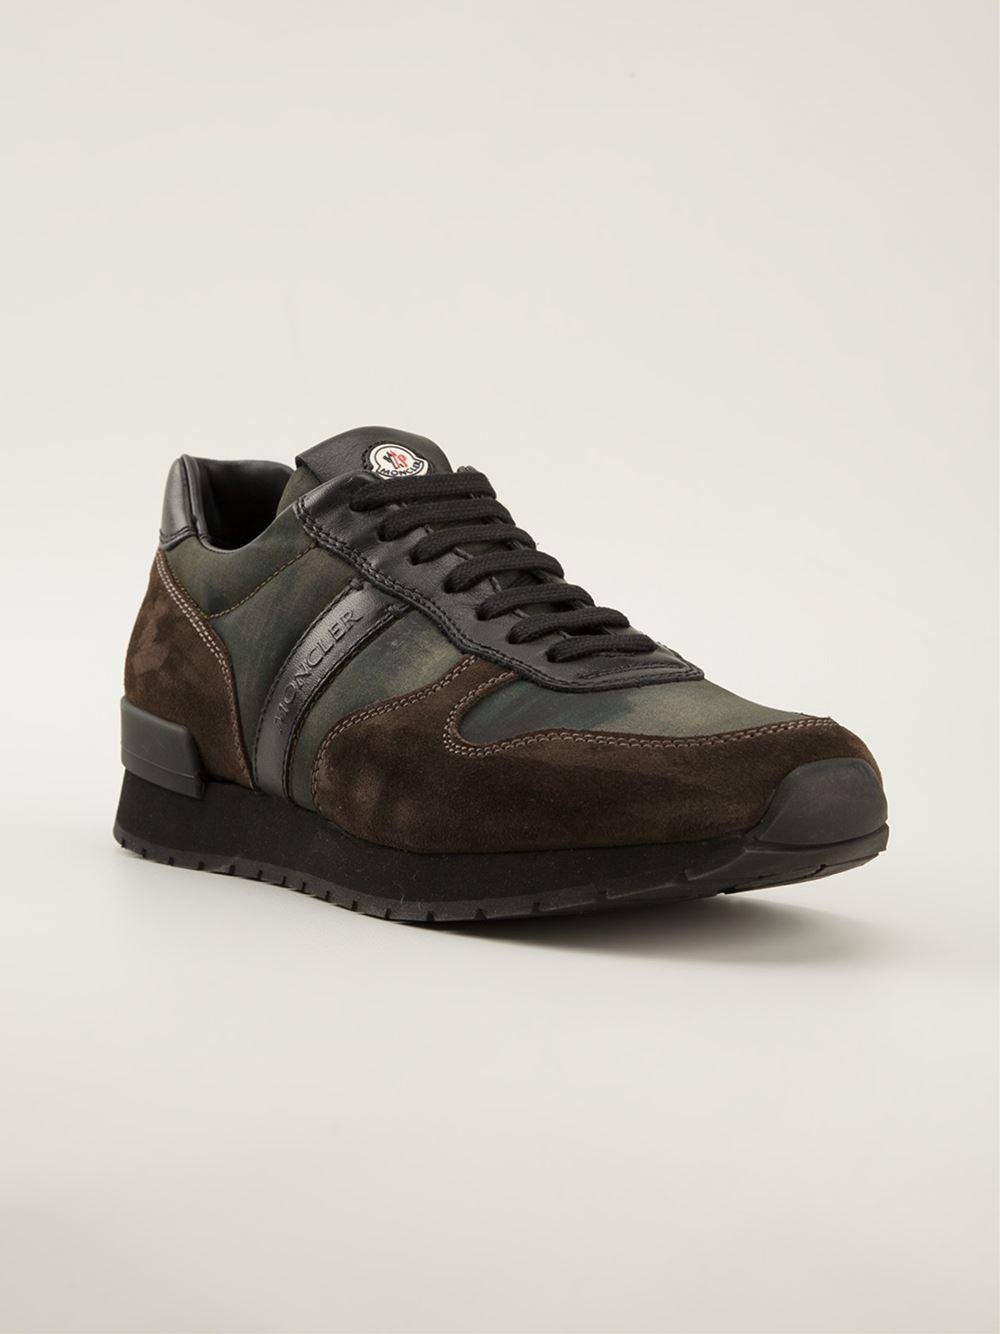 moncler sneakers montego